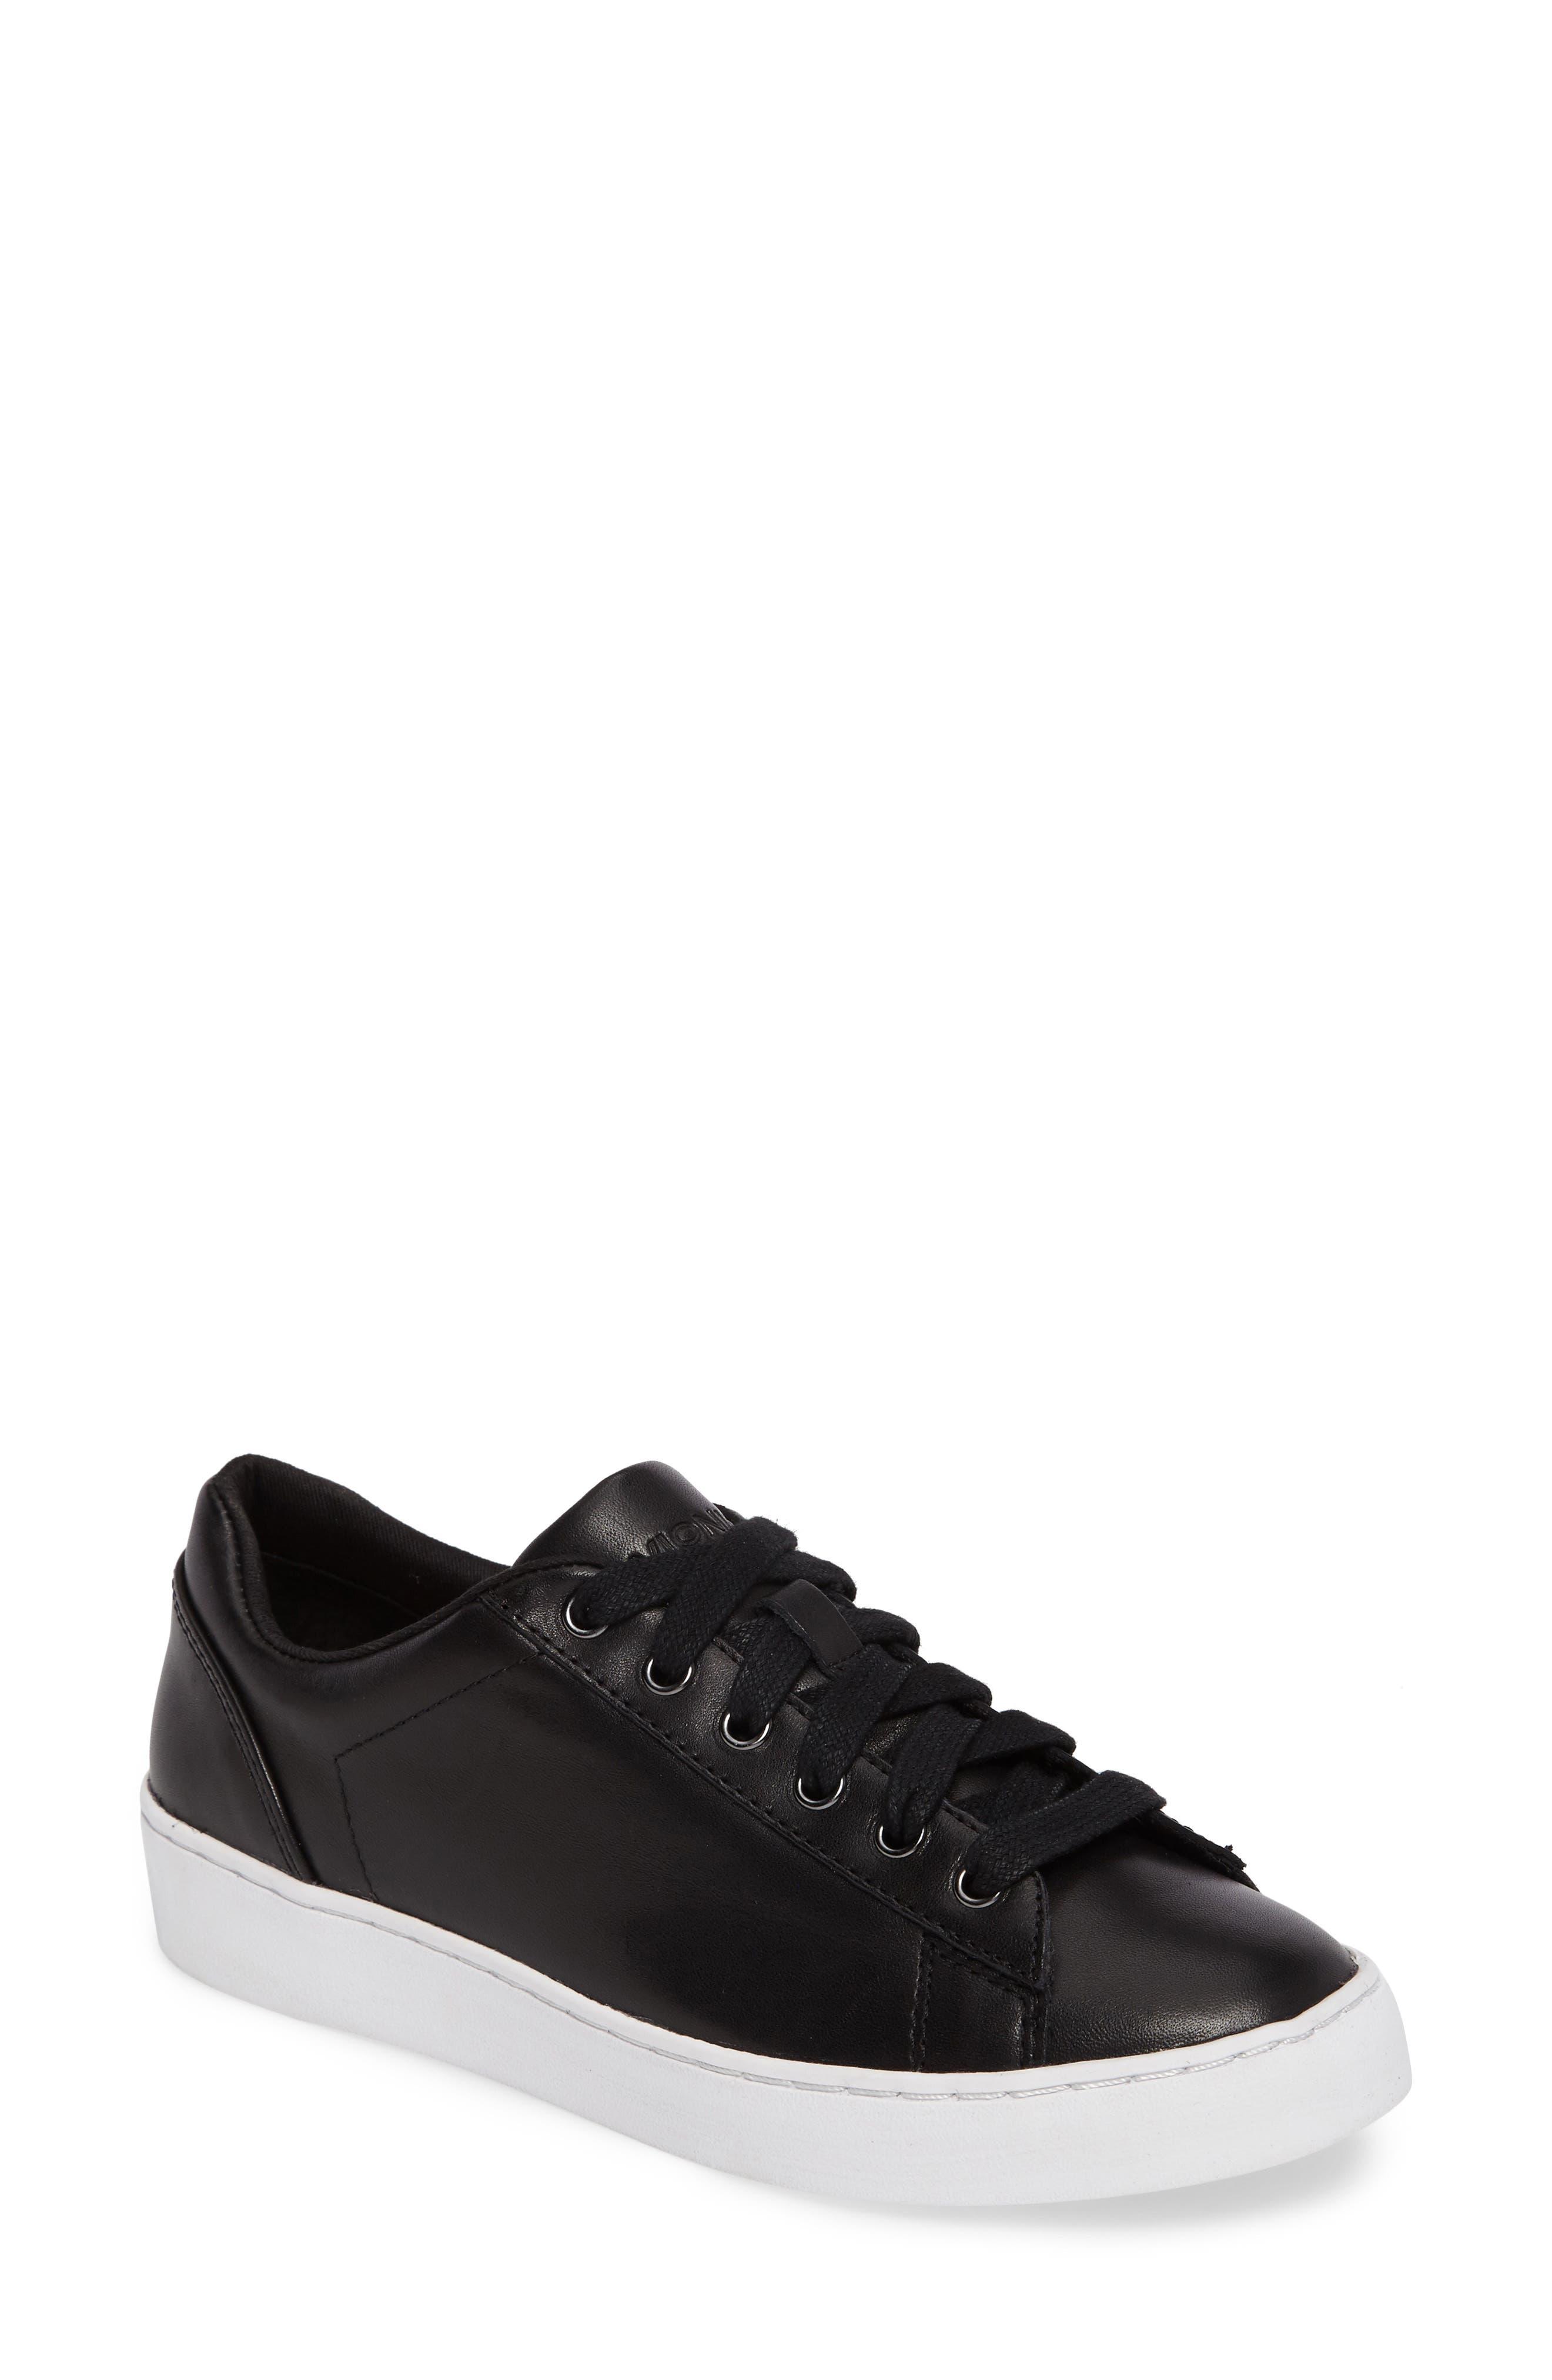 Splendid Syra Sneaker,                         Main,                         color, Black Leather